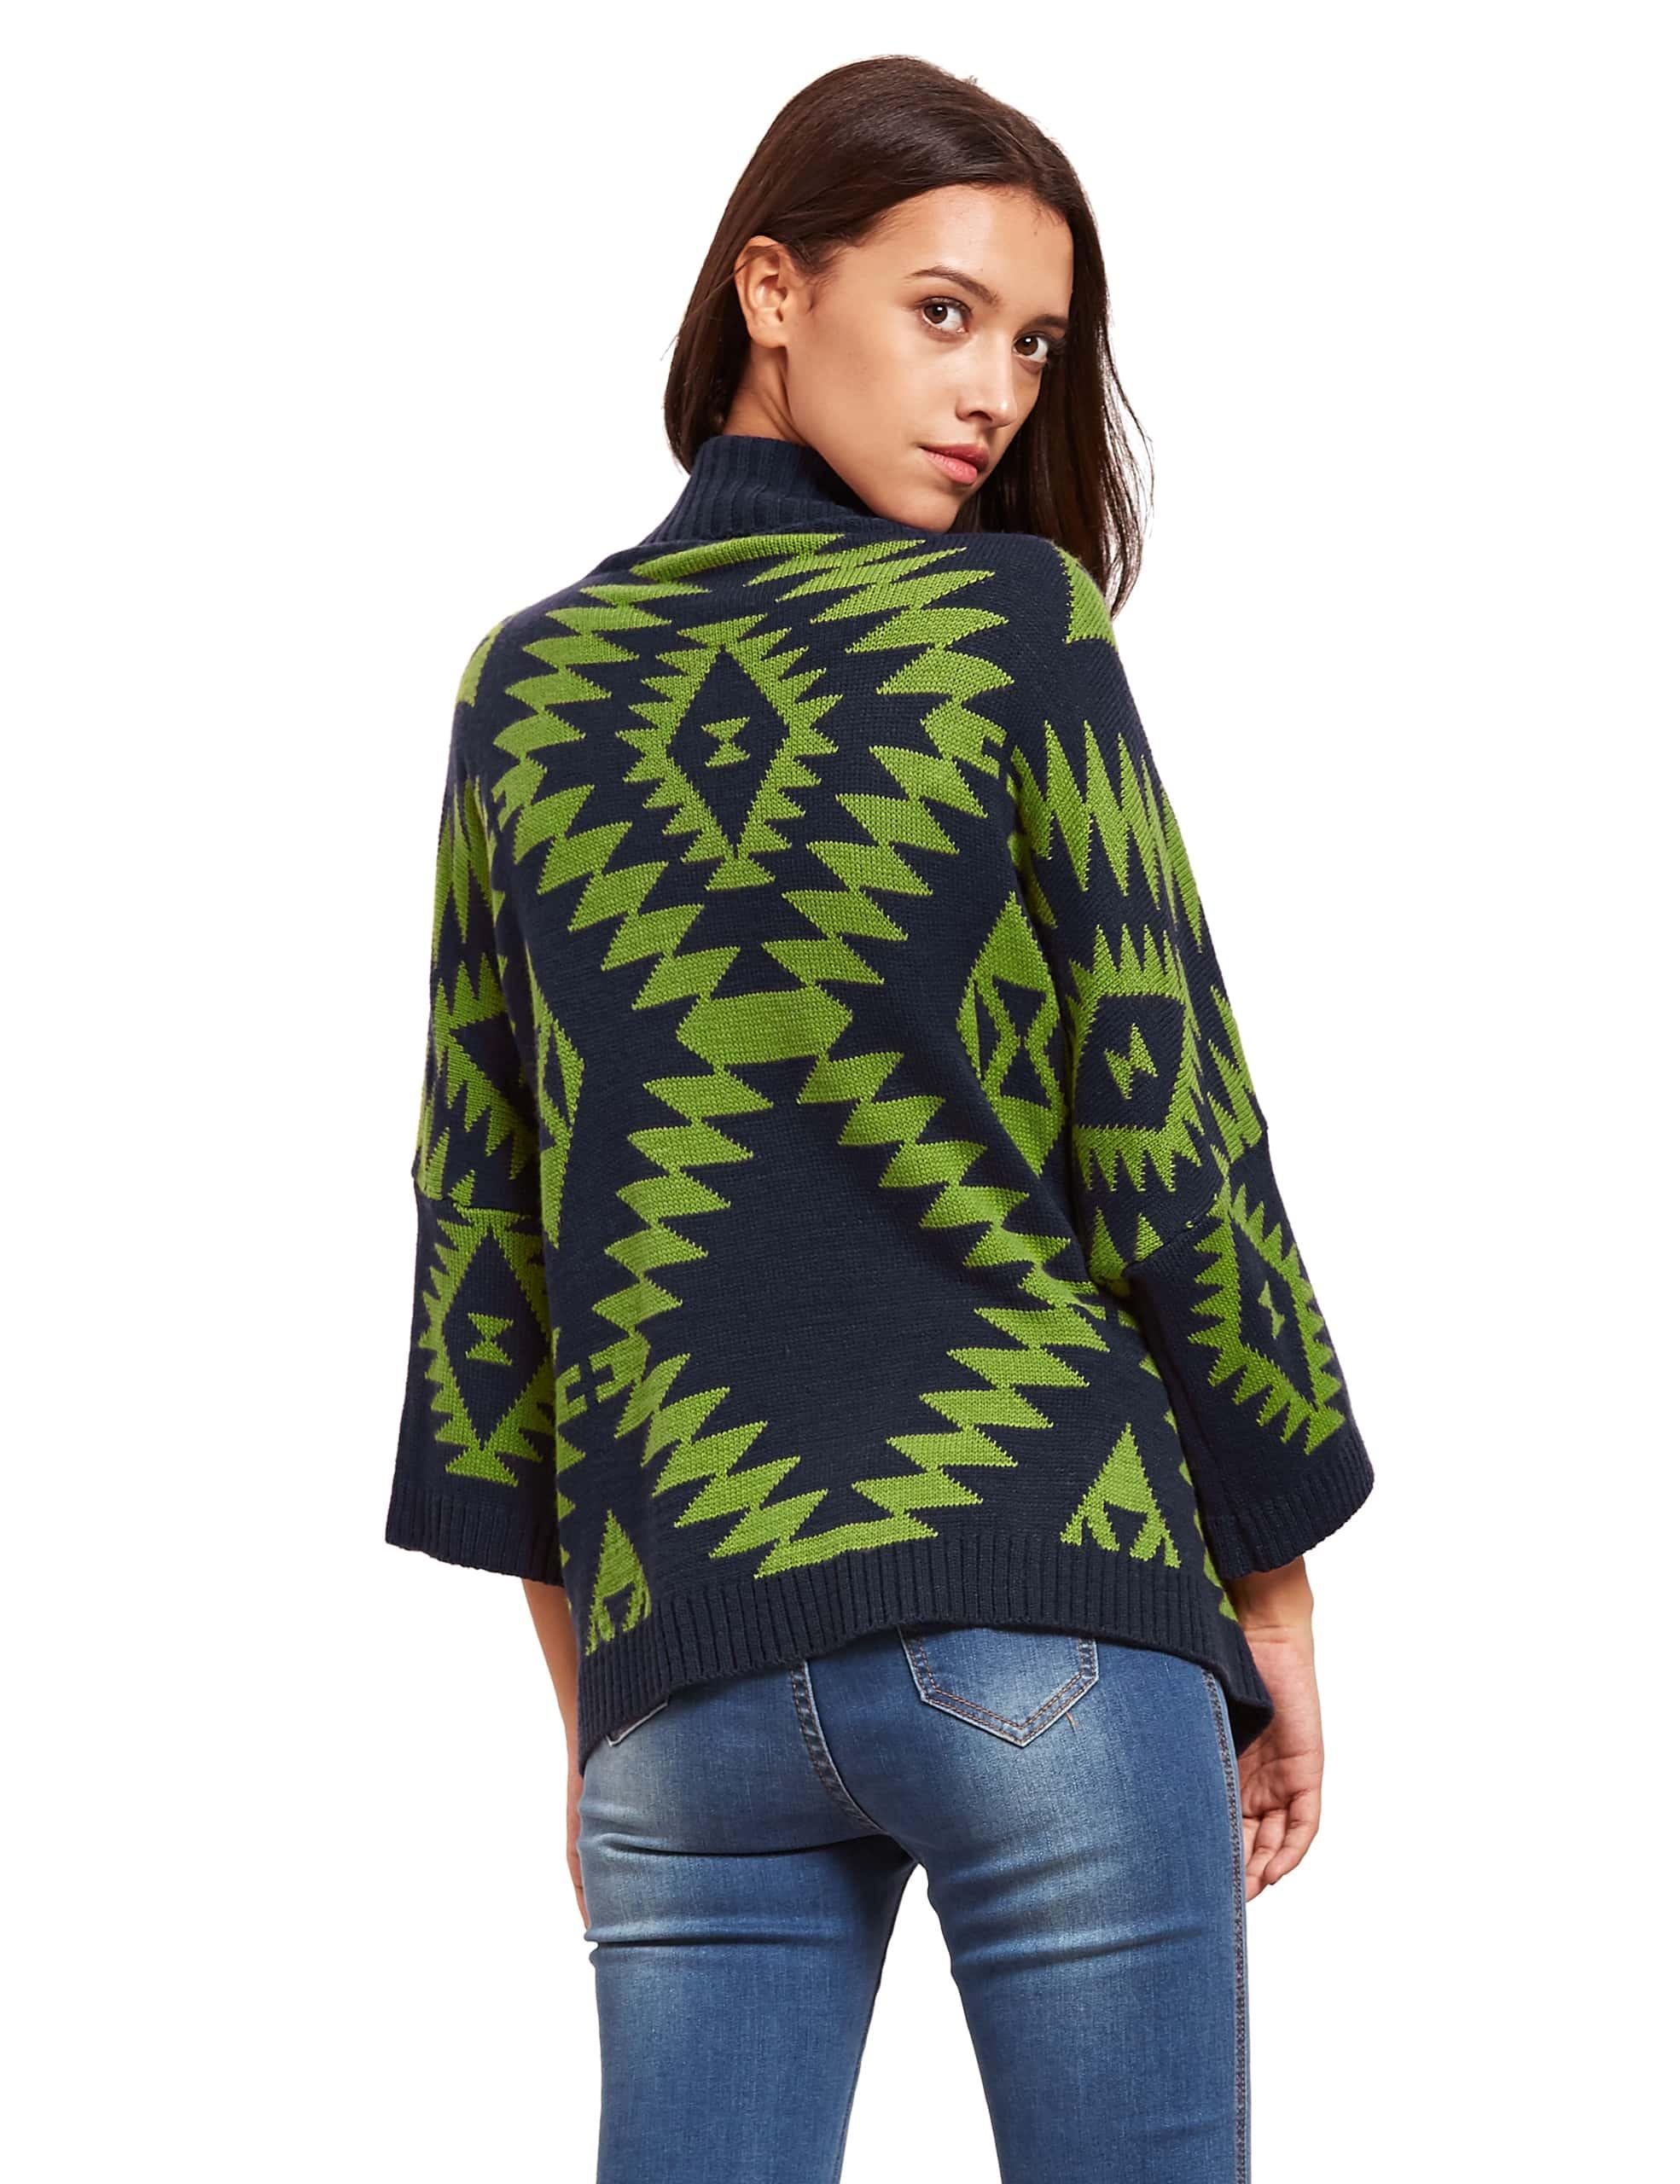 sweater160914471_2